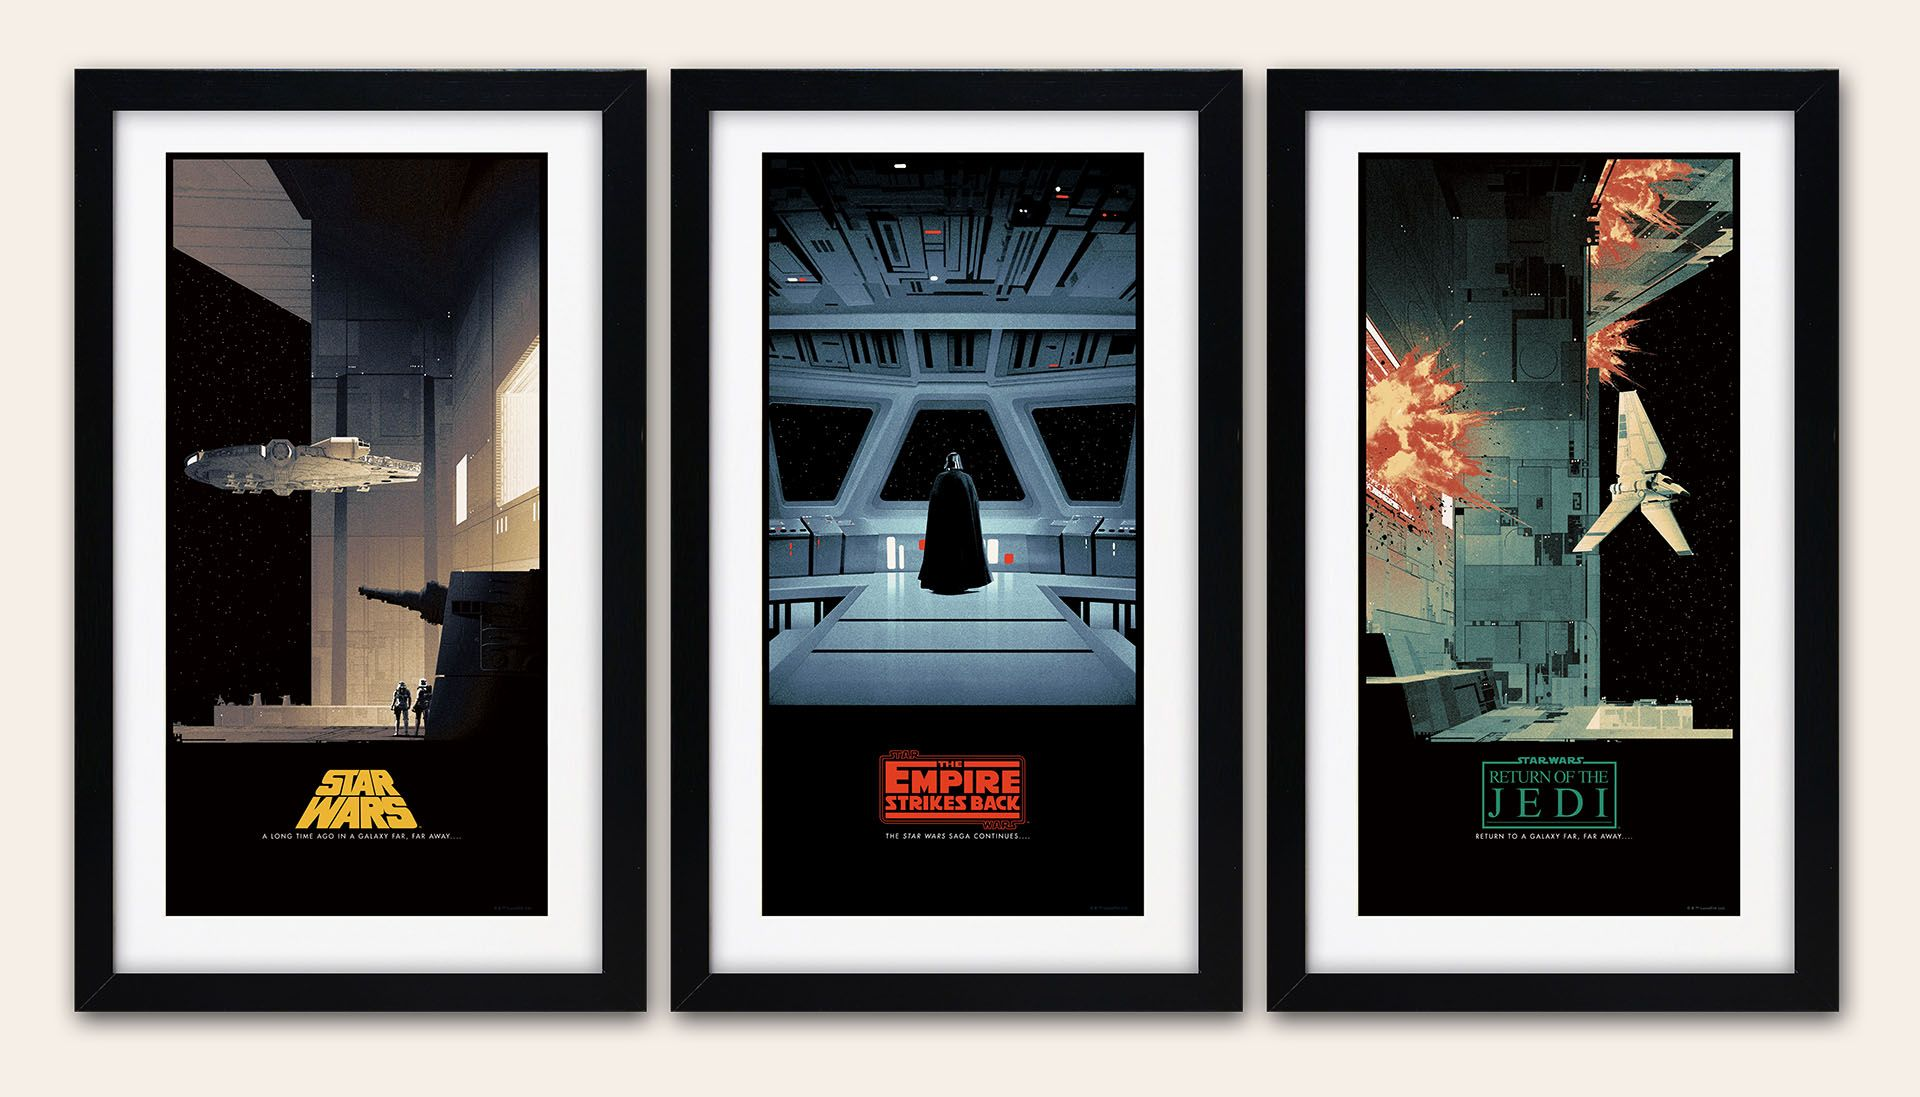 star wars posters by matt ferguson for bottleneck gallery | collider